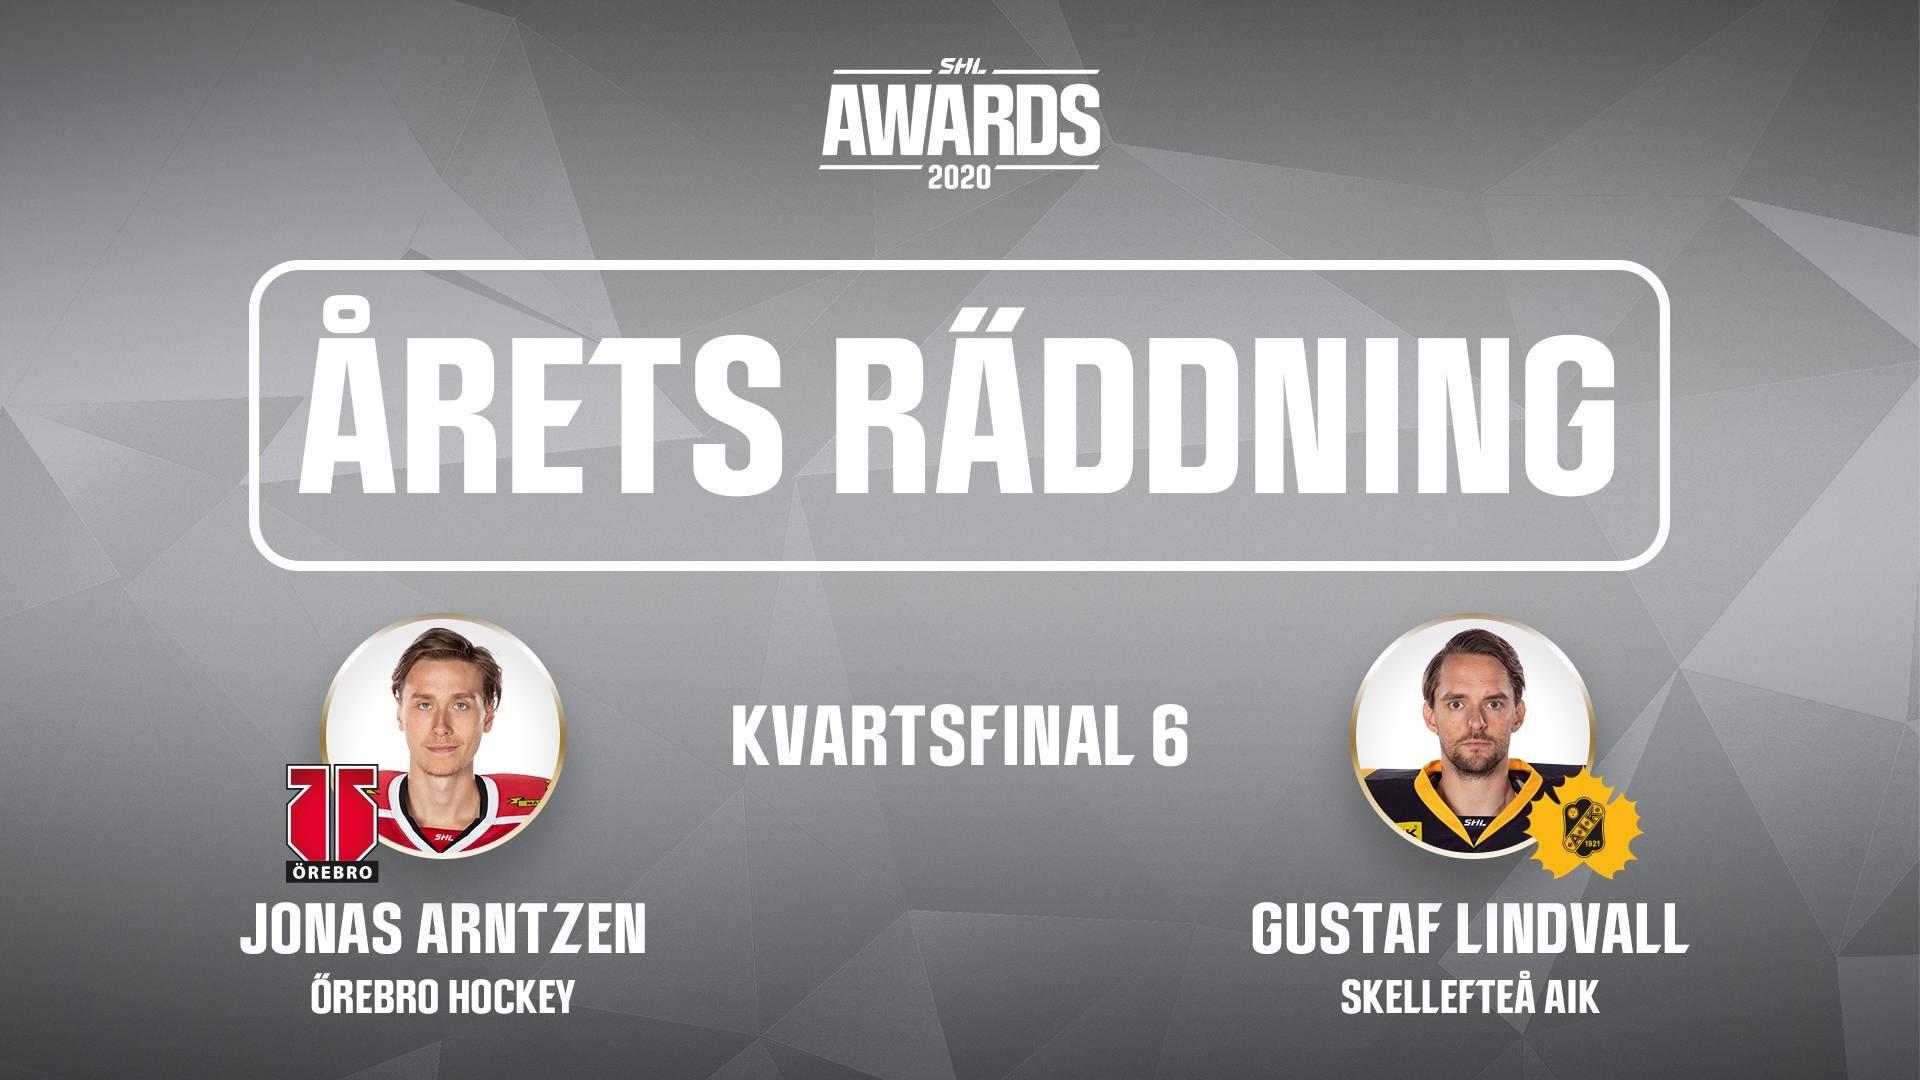 Årets räddning 2019/2020 - Kvartsfinal 6